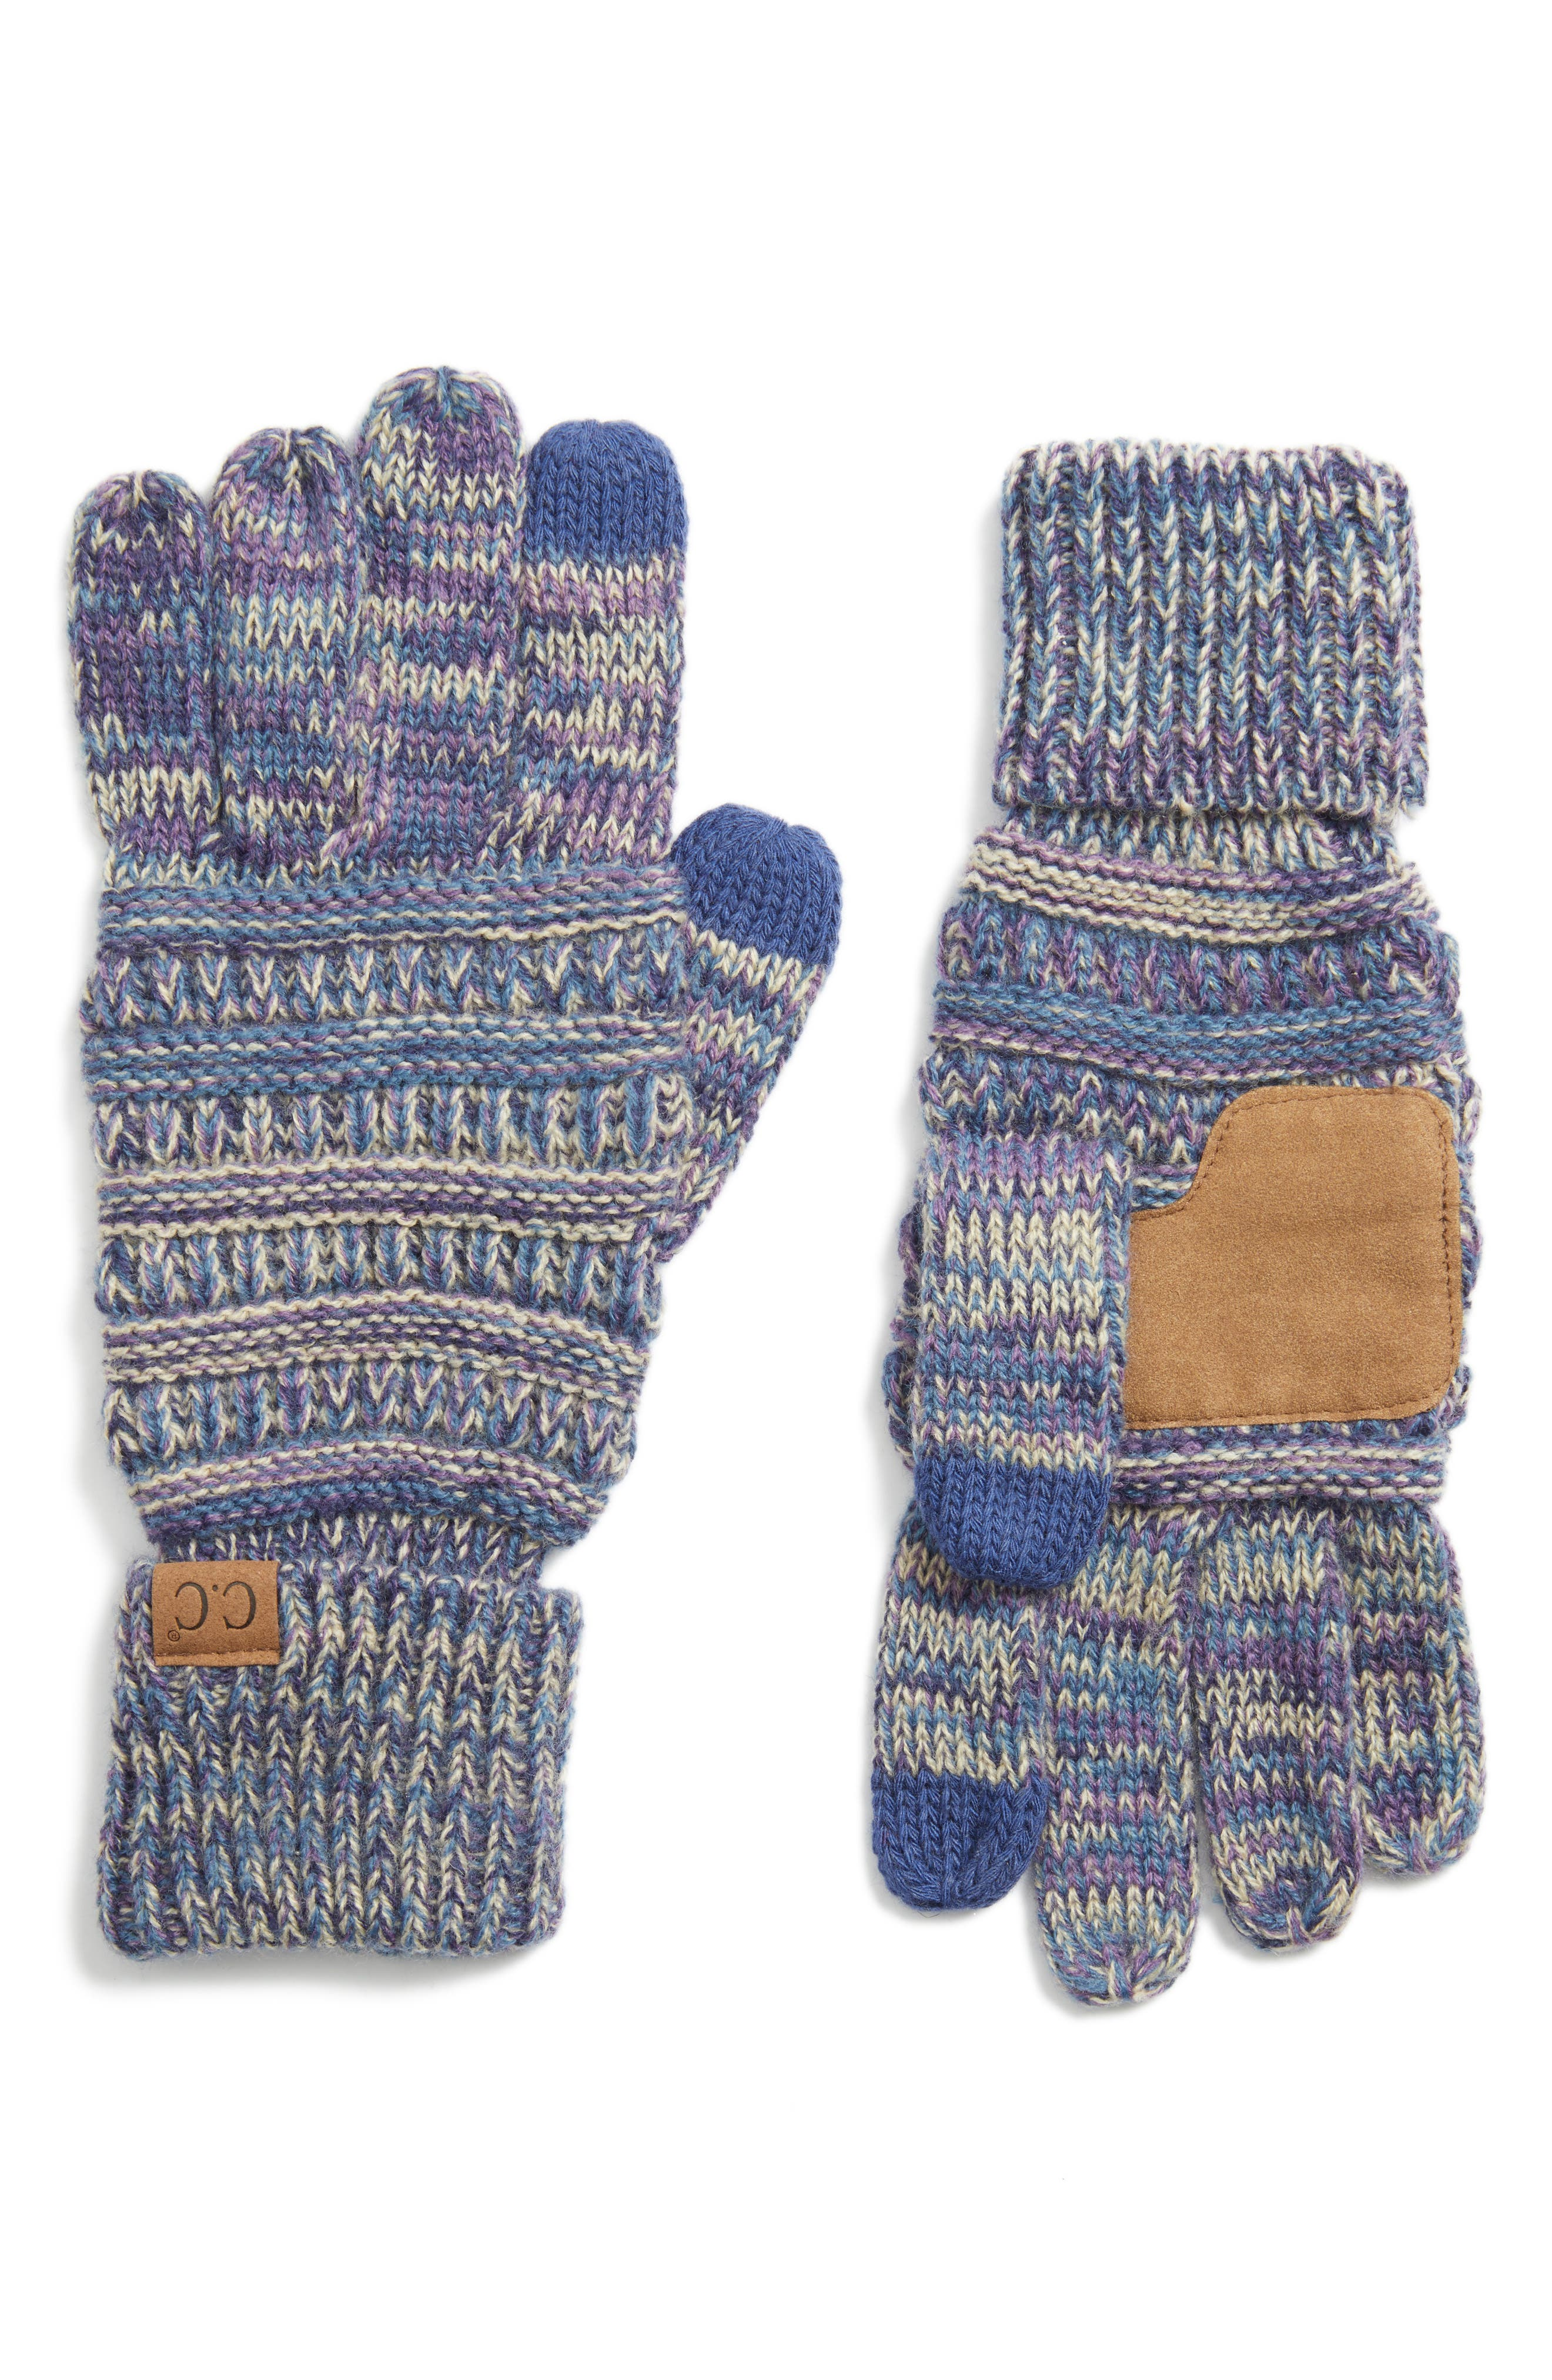 Knit Tech Gloves,                         Main,                         color, Purple/ Dark Denim/ Beige